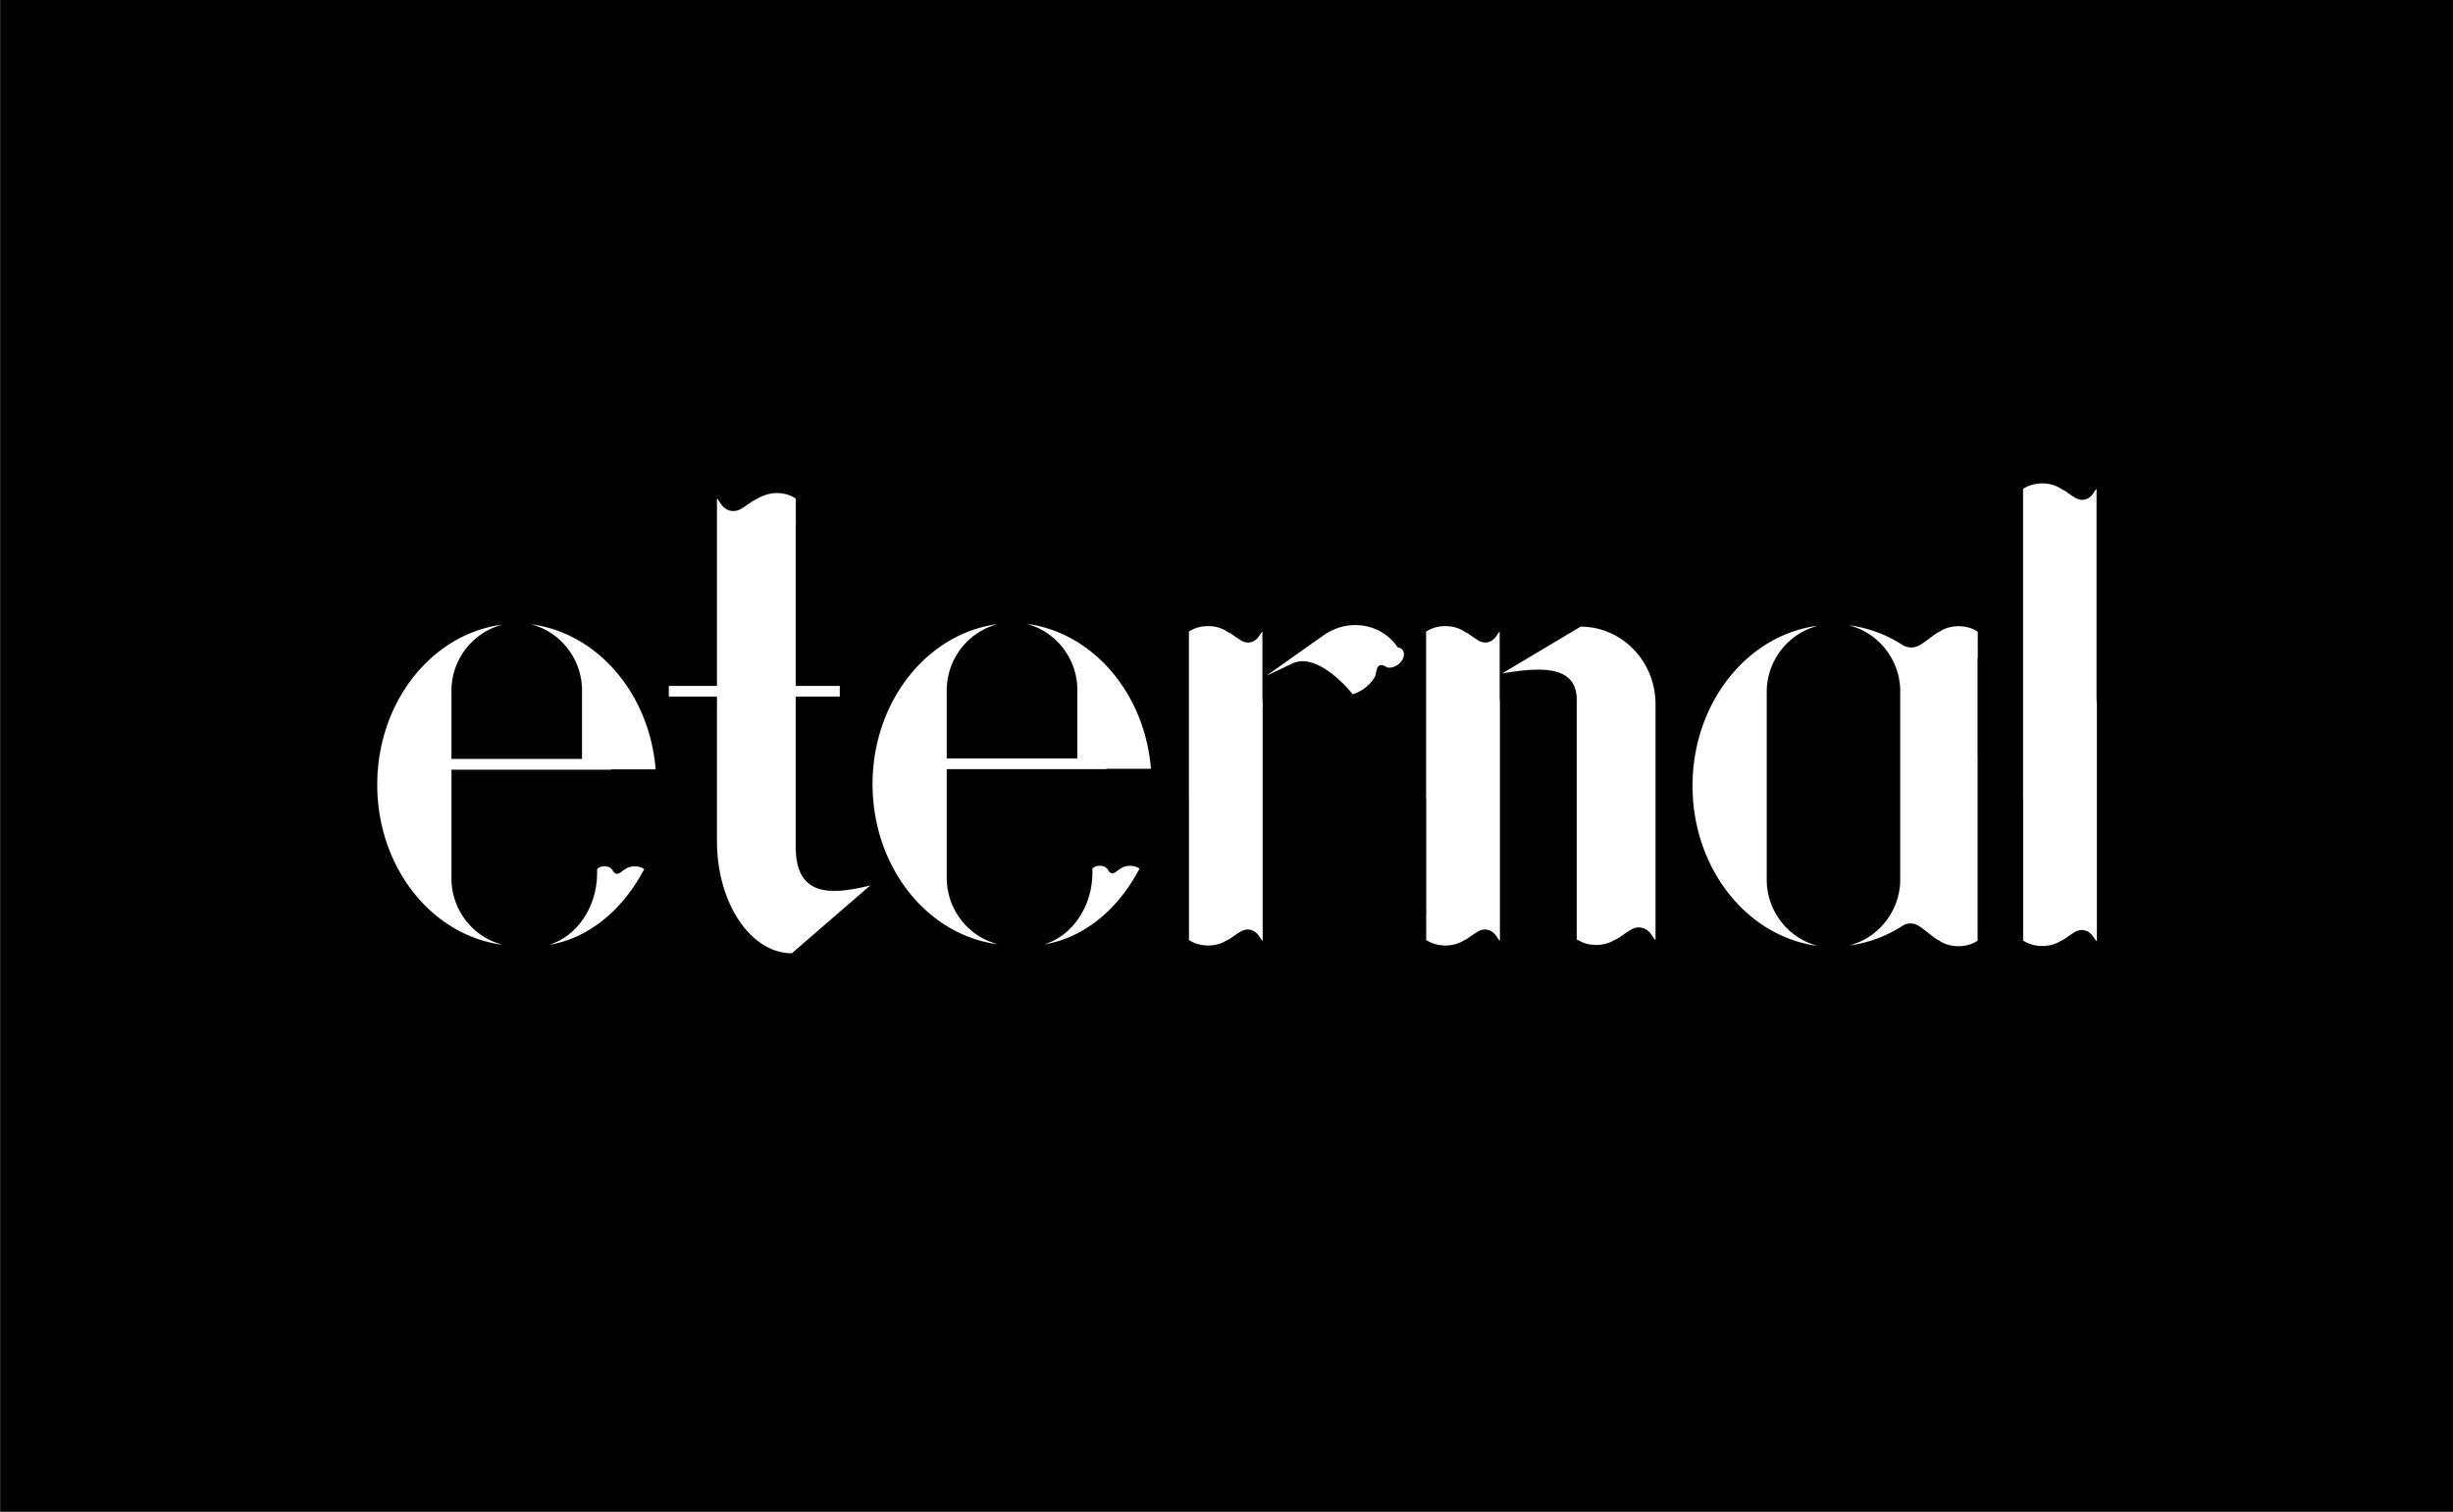 callas typeface rework-16.jpg